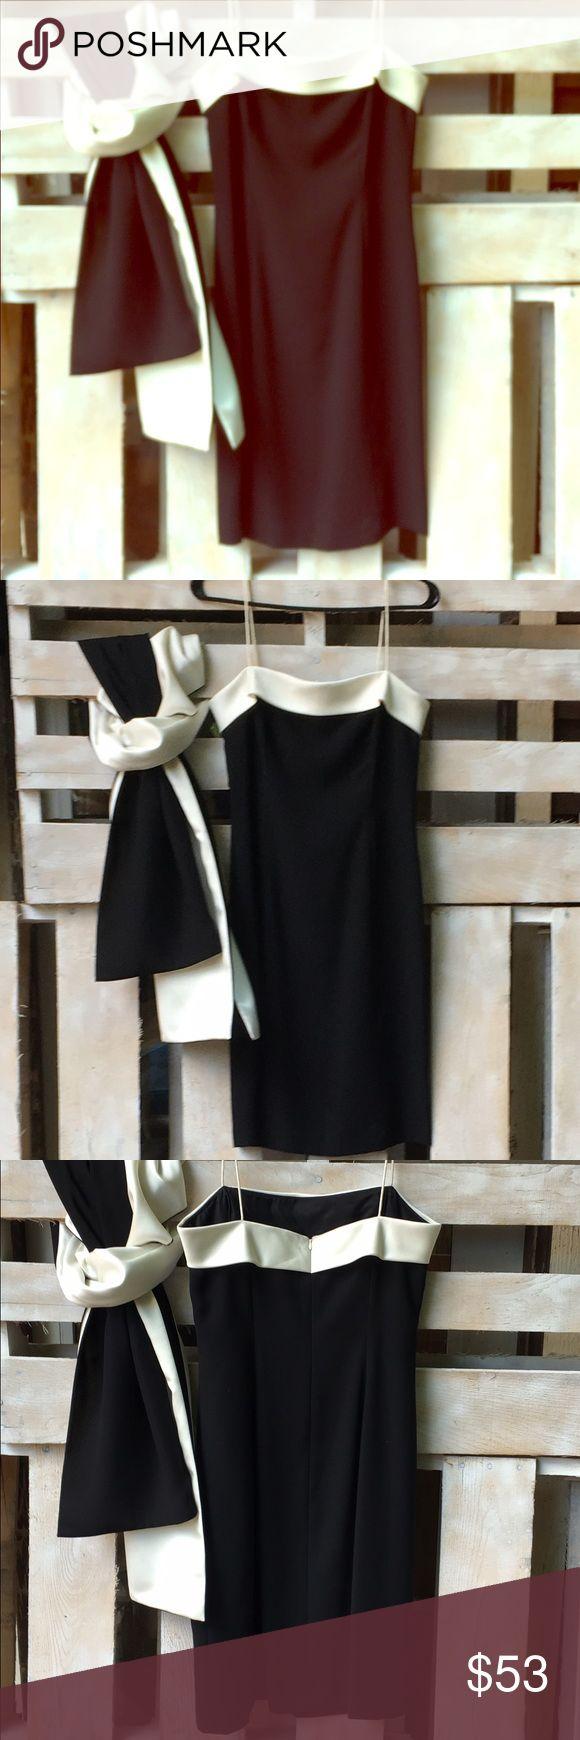 Ann Taylor black w cream cocktail dress & wrap Ann Taylor black w cream cocktail dress & wrap. Never worn. Ann Taylor Dresses Mini